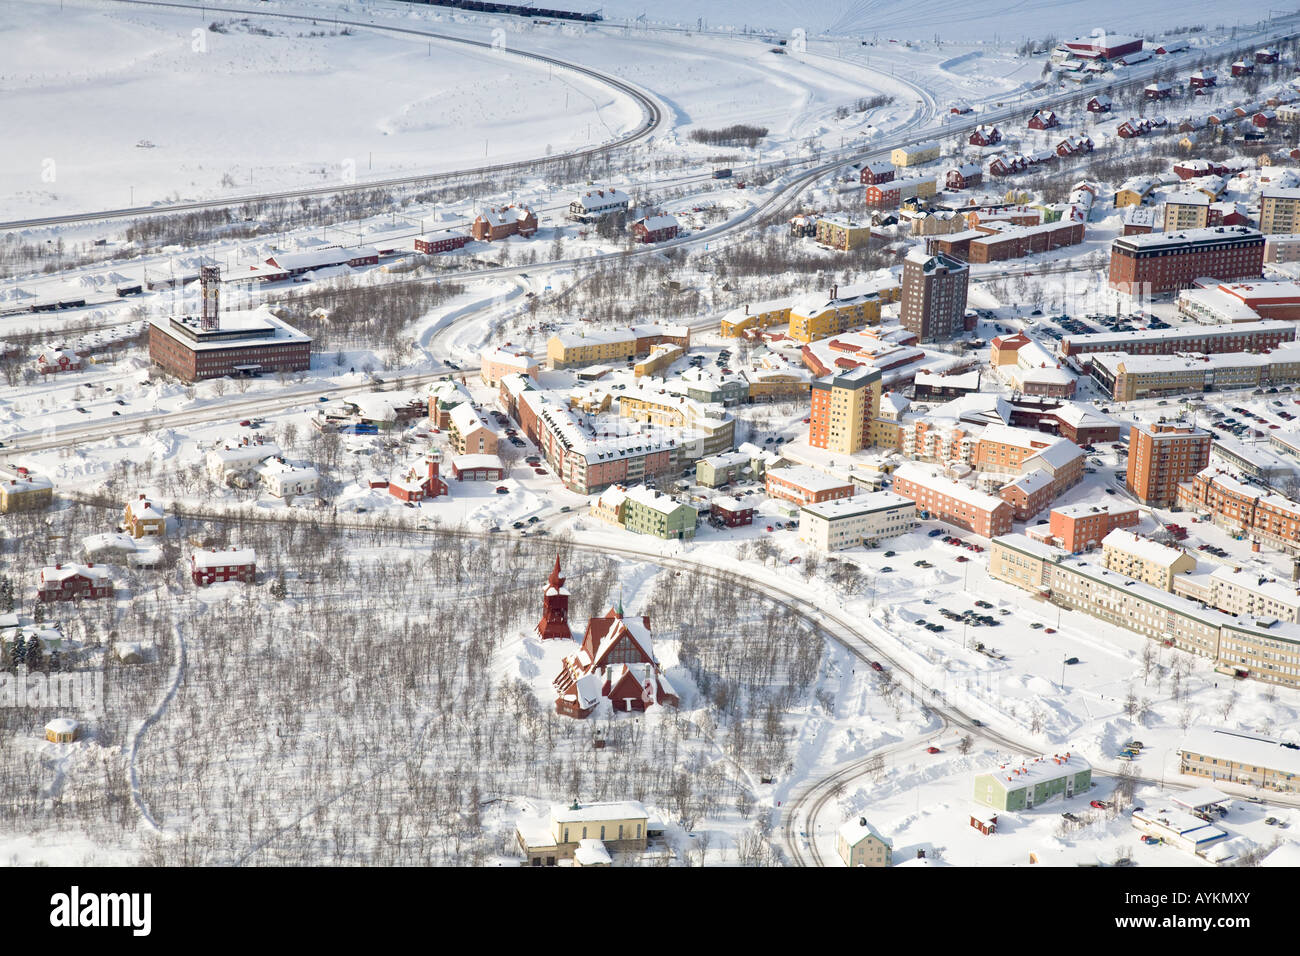 Aerial view of Kiruna in northern Sweden - Stock Image